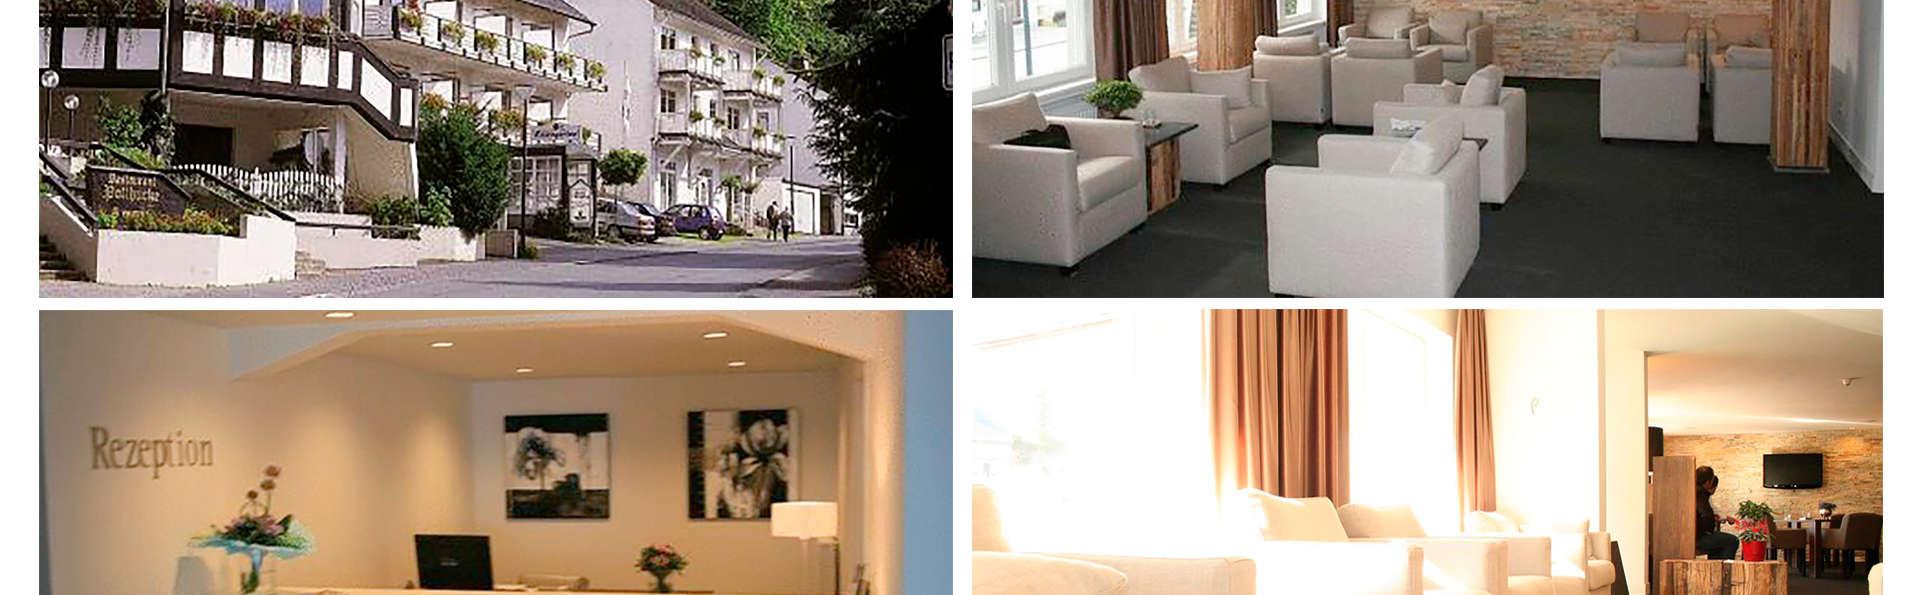 Design hotel sauerland bad fredeburg duitsland for Designhotel sauerland